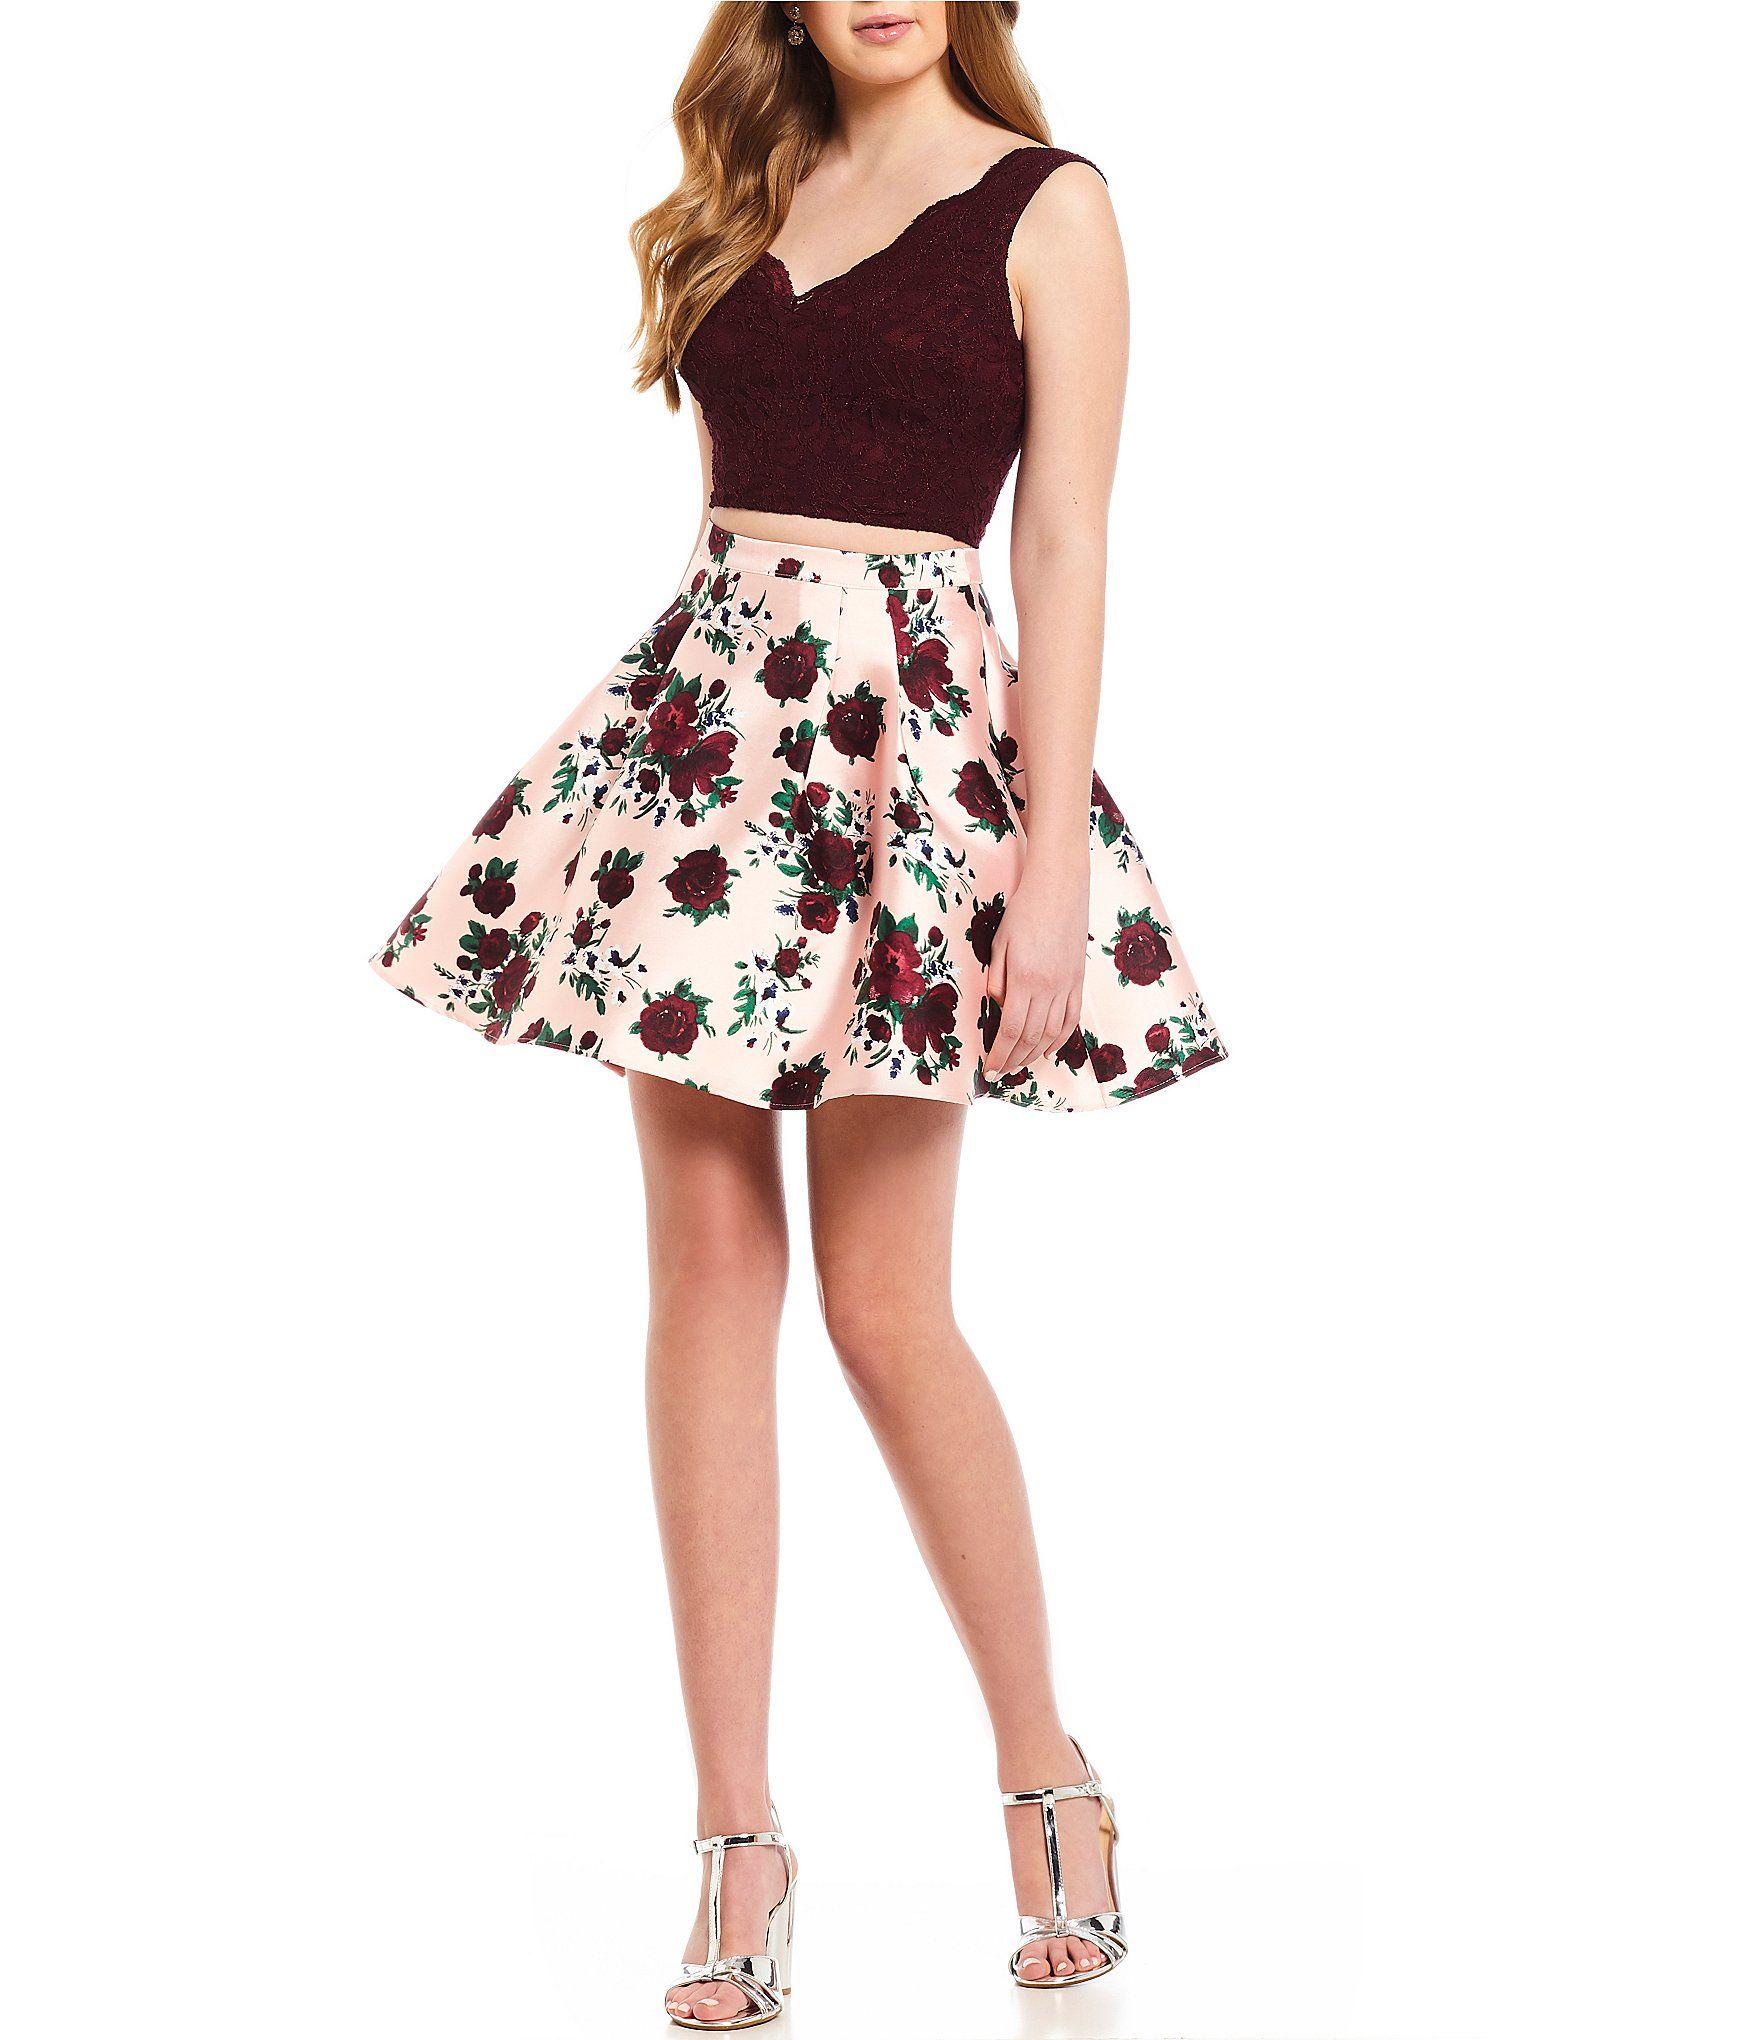 58efec0e95 B Darlin Lace Tank with Floral Print Skirt TwoPiece Dress #Dillards ...